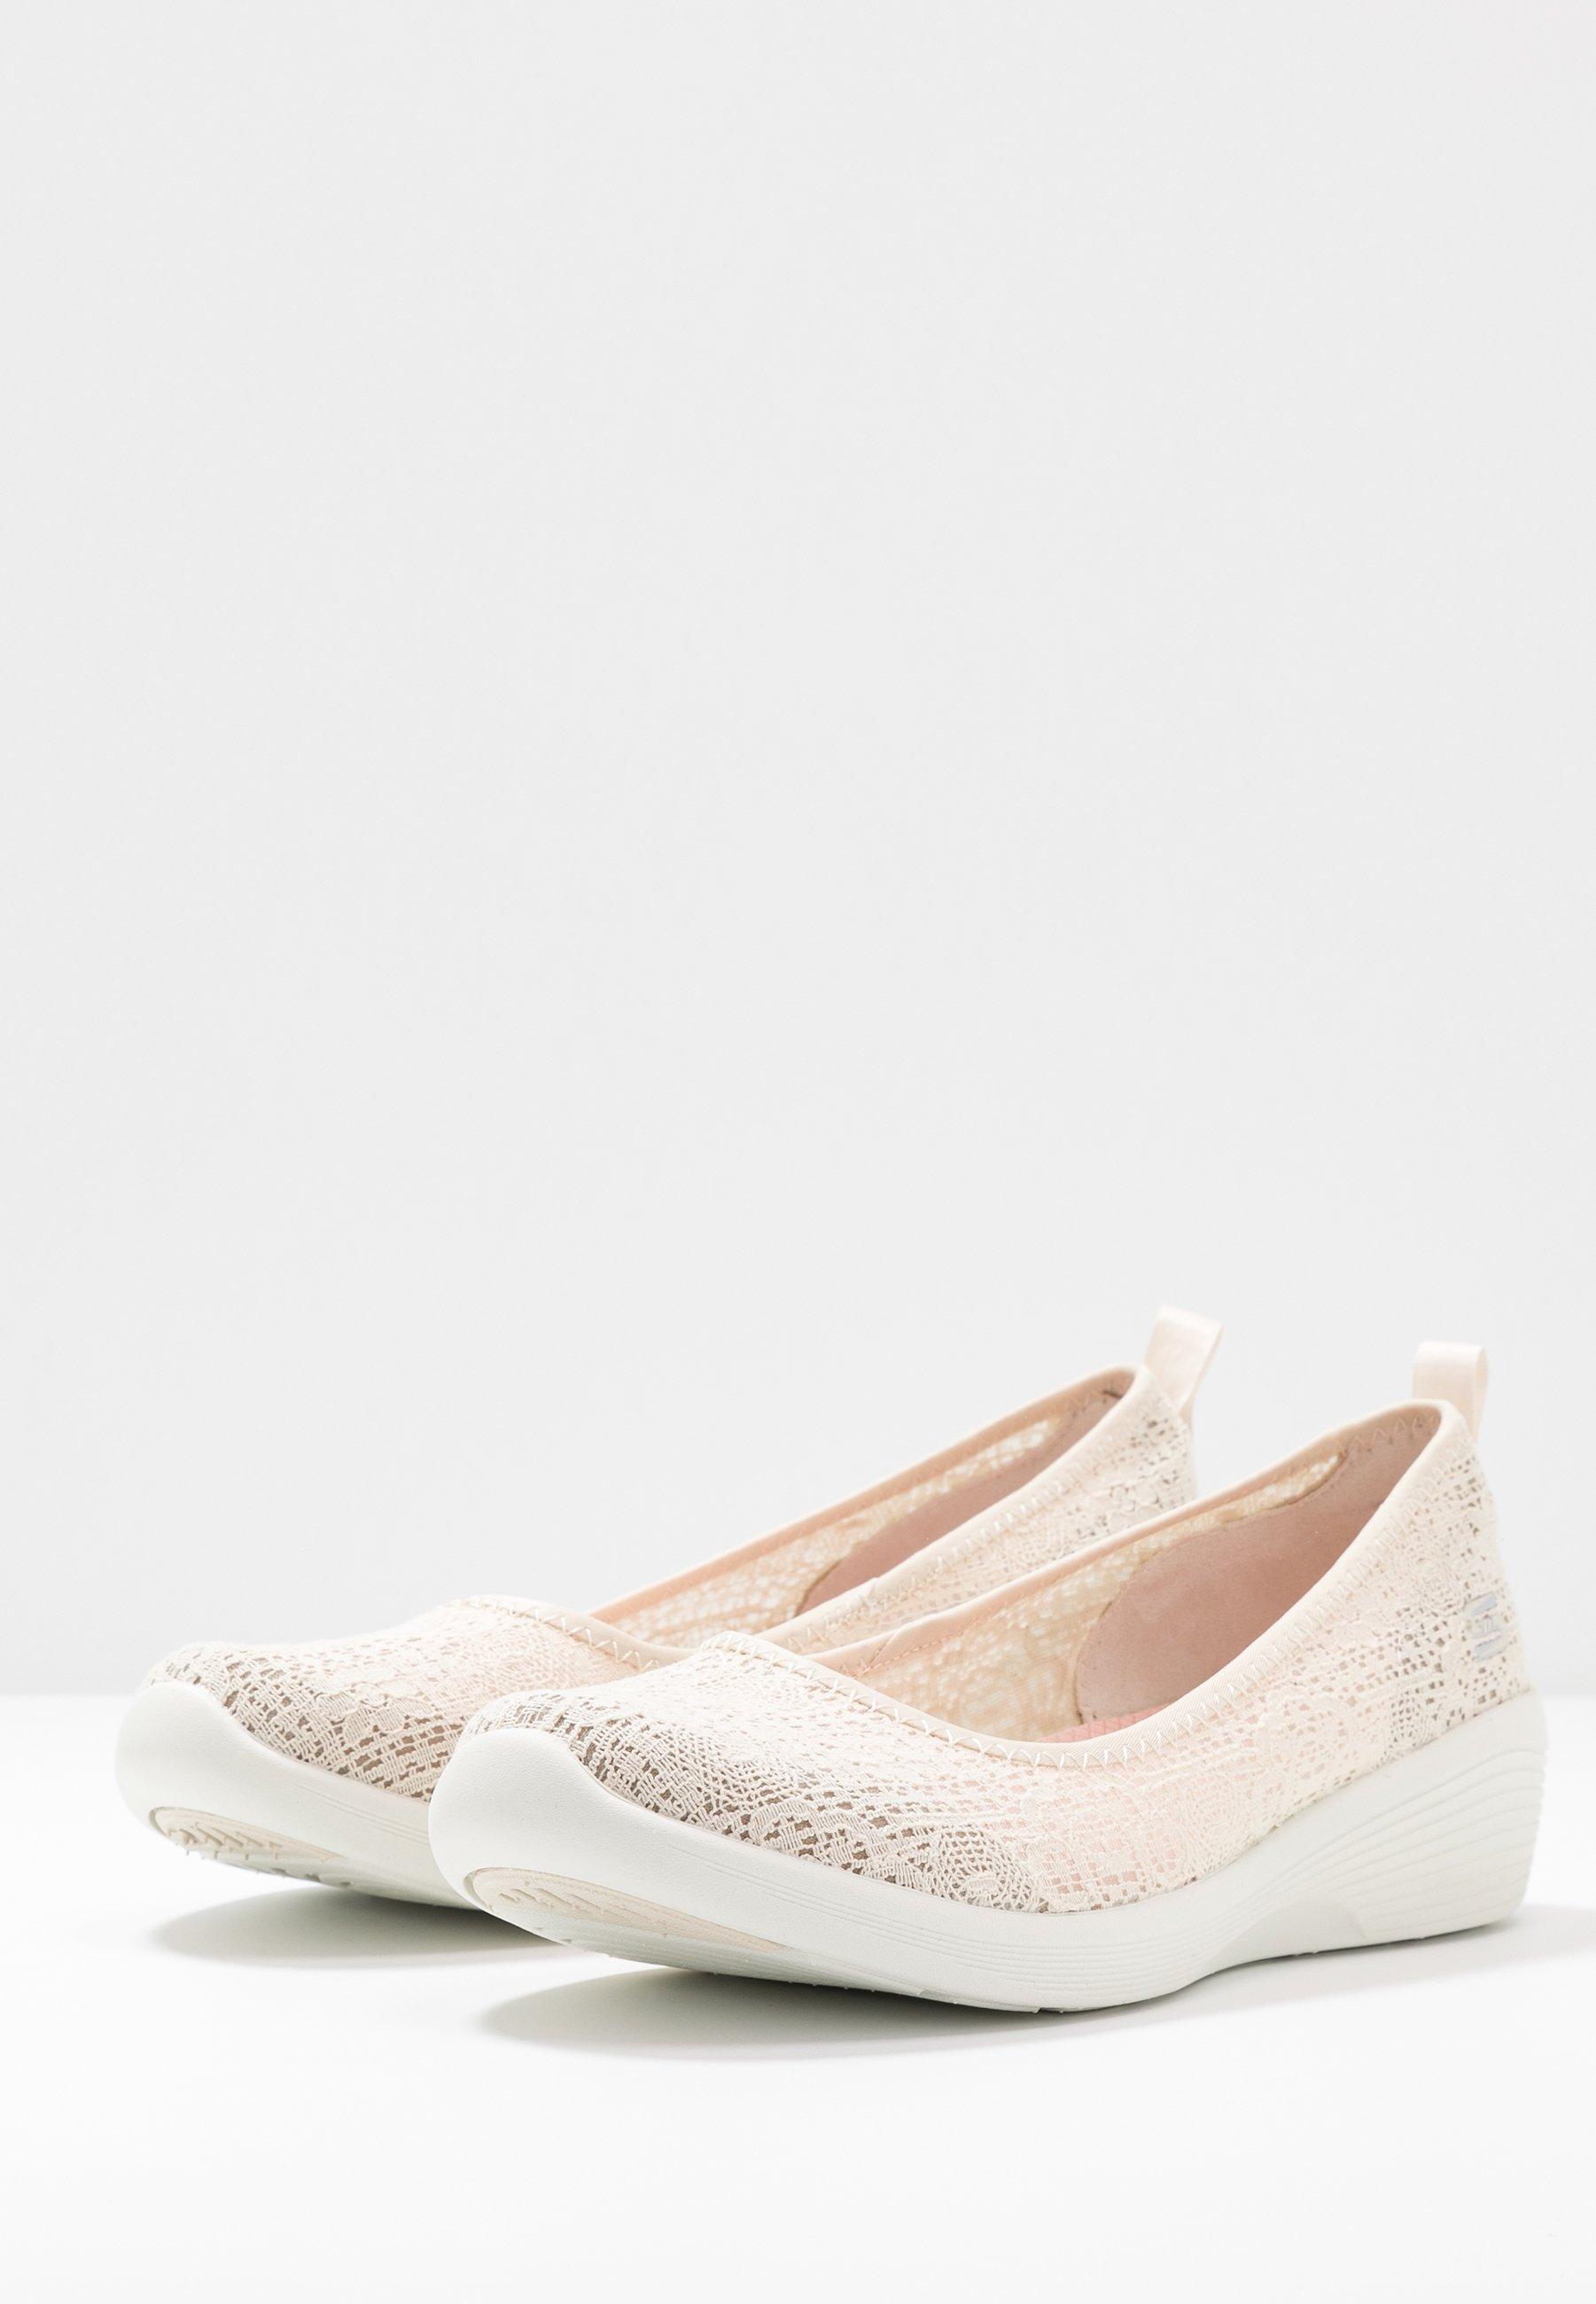 Skechers ARYA Klassischer Ballerina natural/offwhite/beige